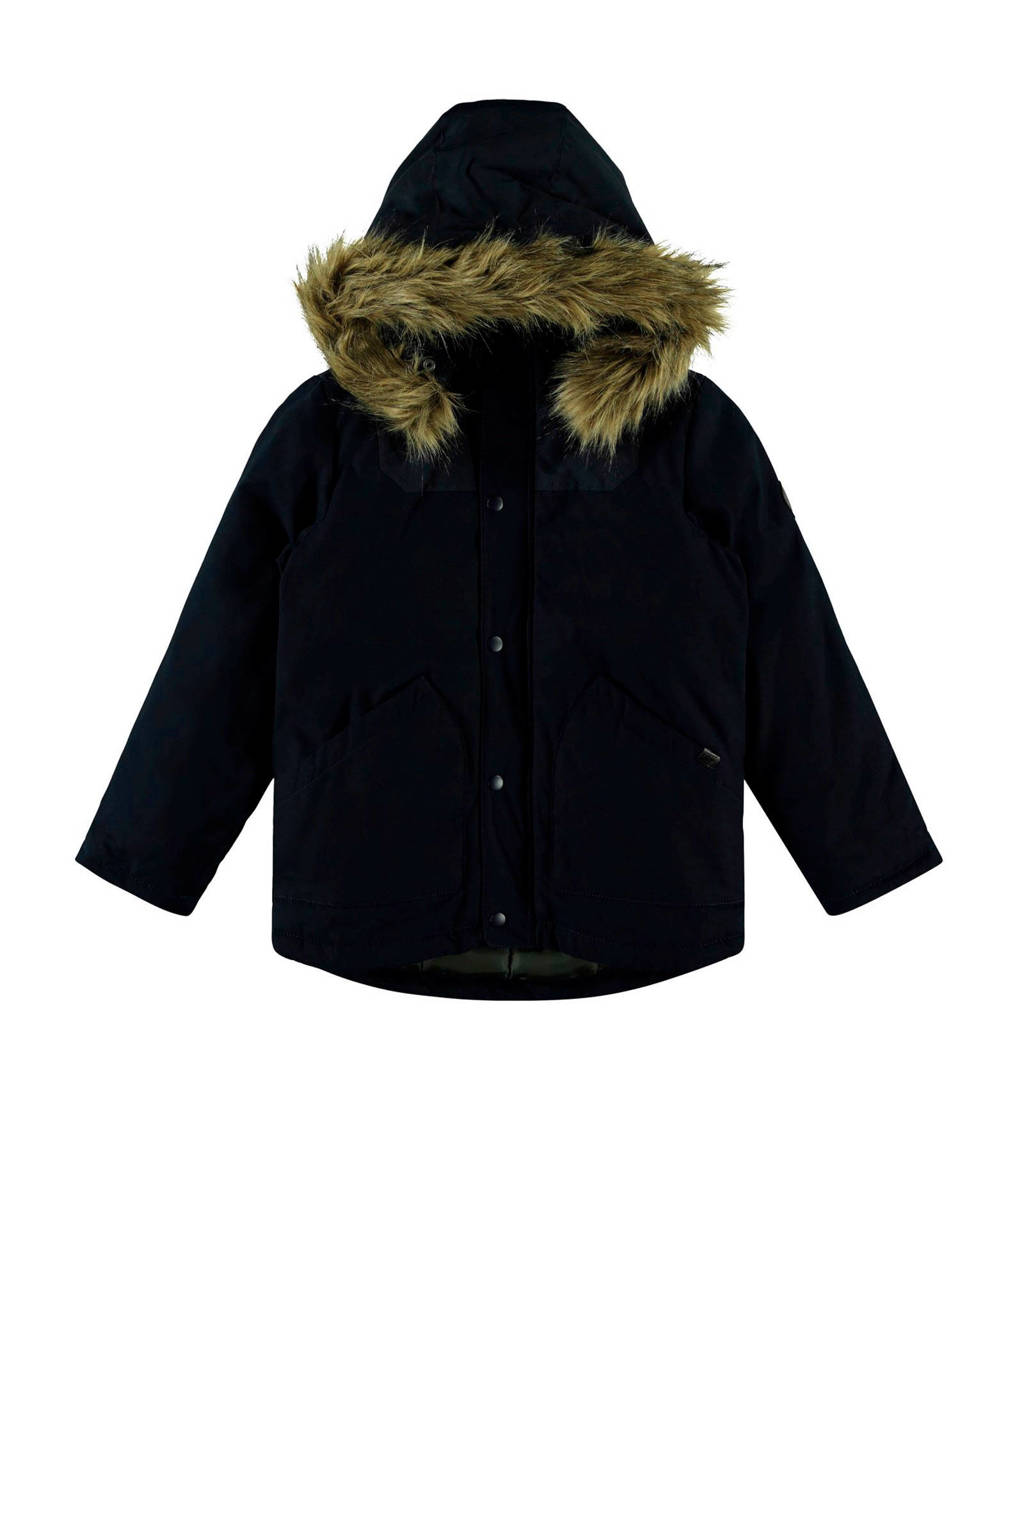 NAME IT KIDS winterjas donkerblauw, Donkerblauw